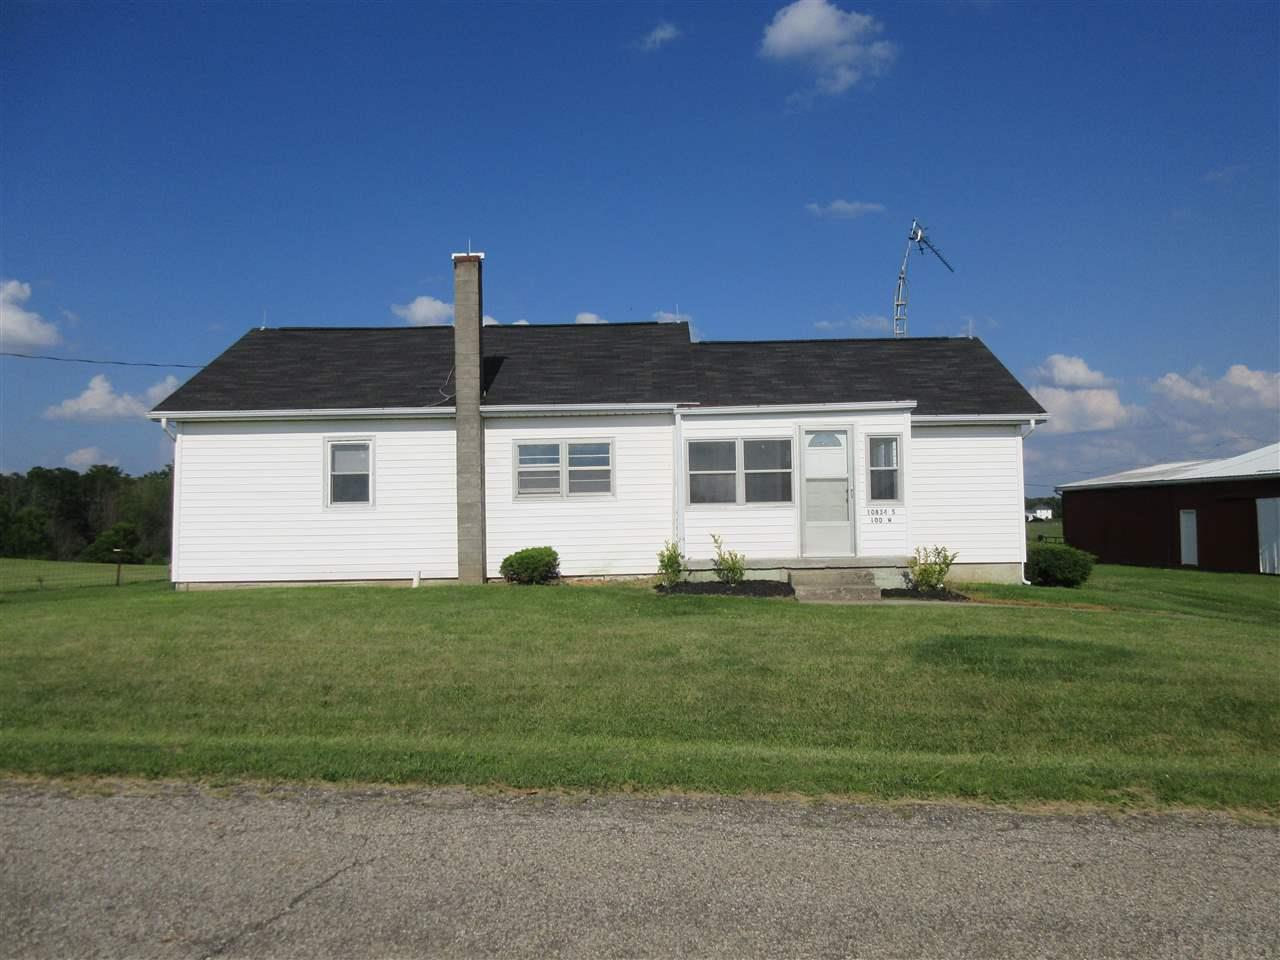 10834 S 100 W, Silver Lake, IN 46982